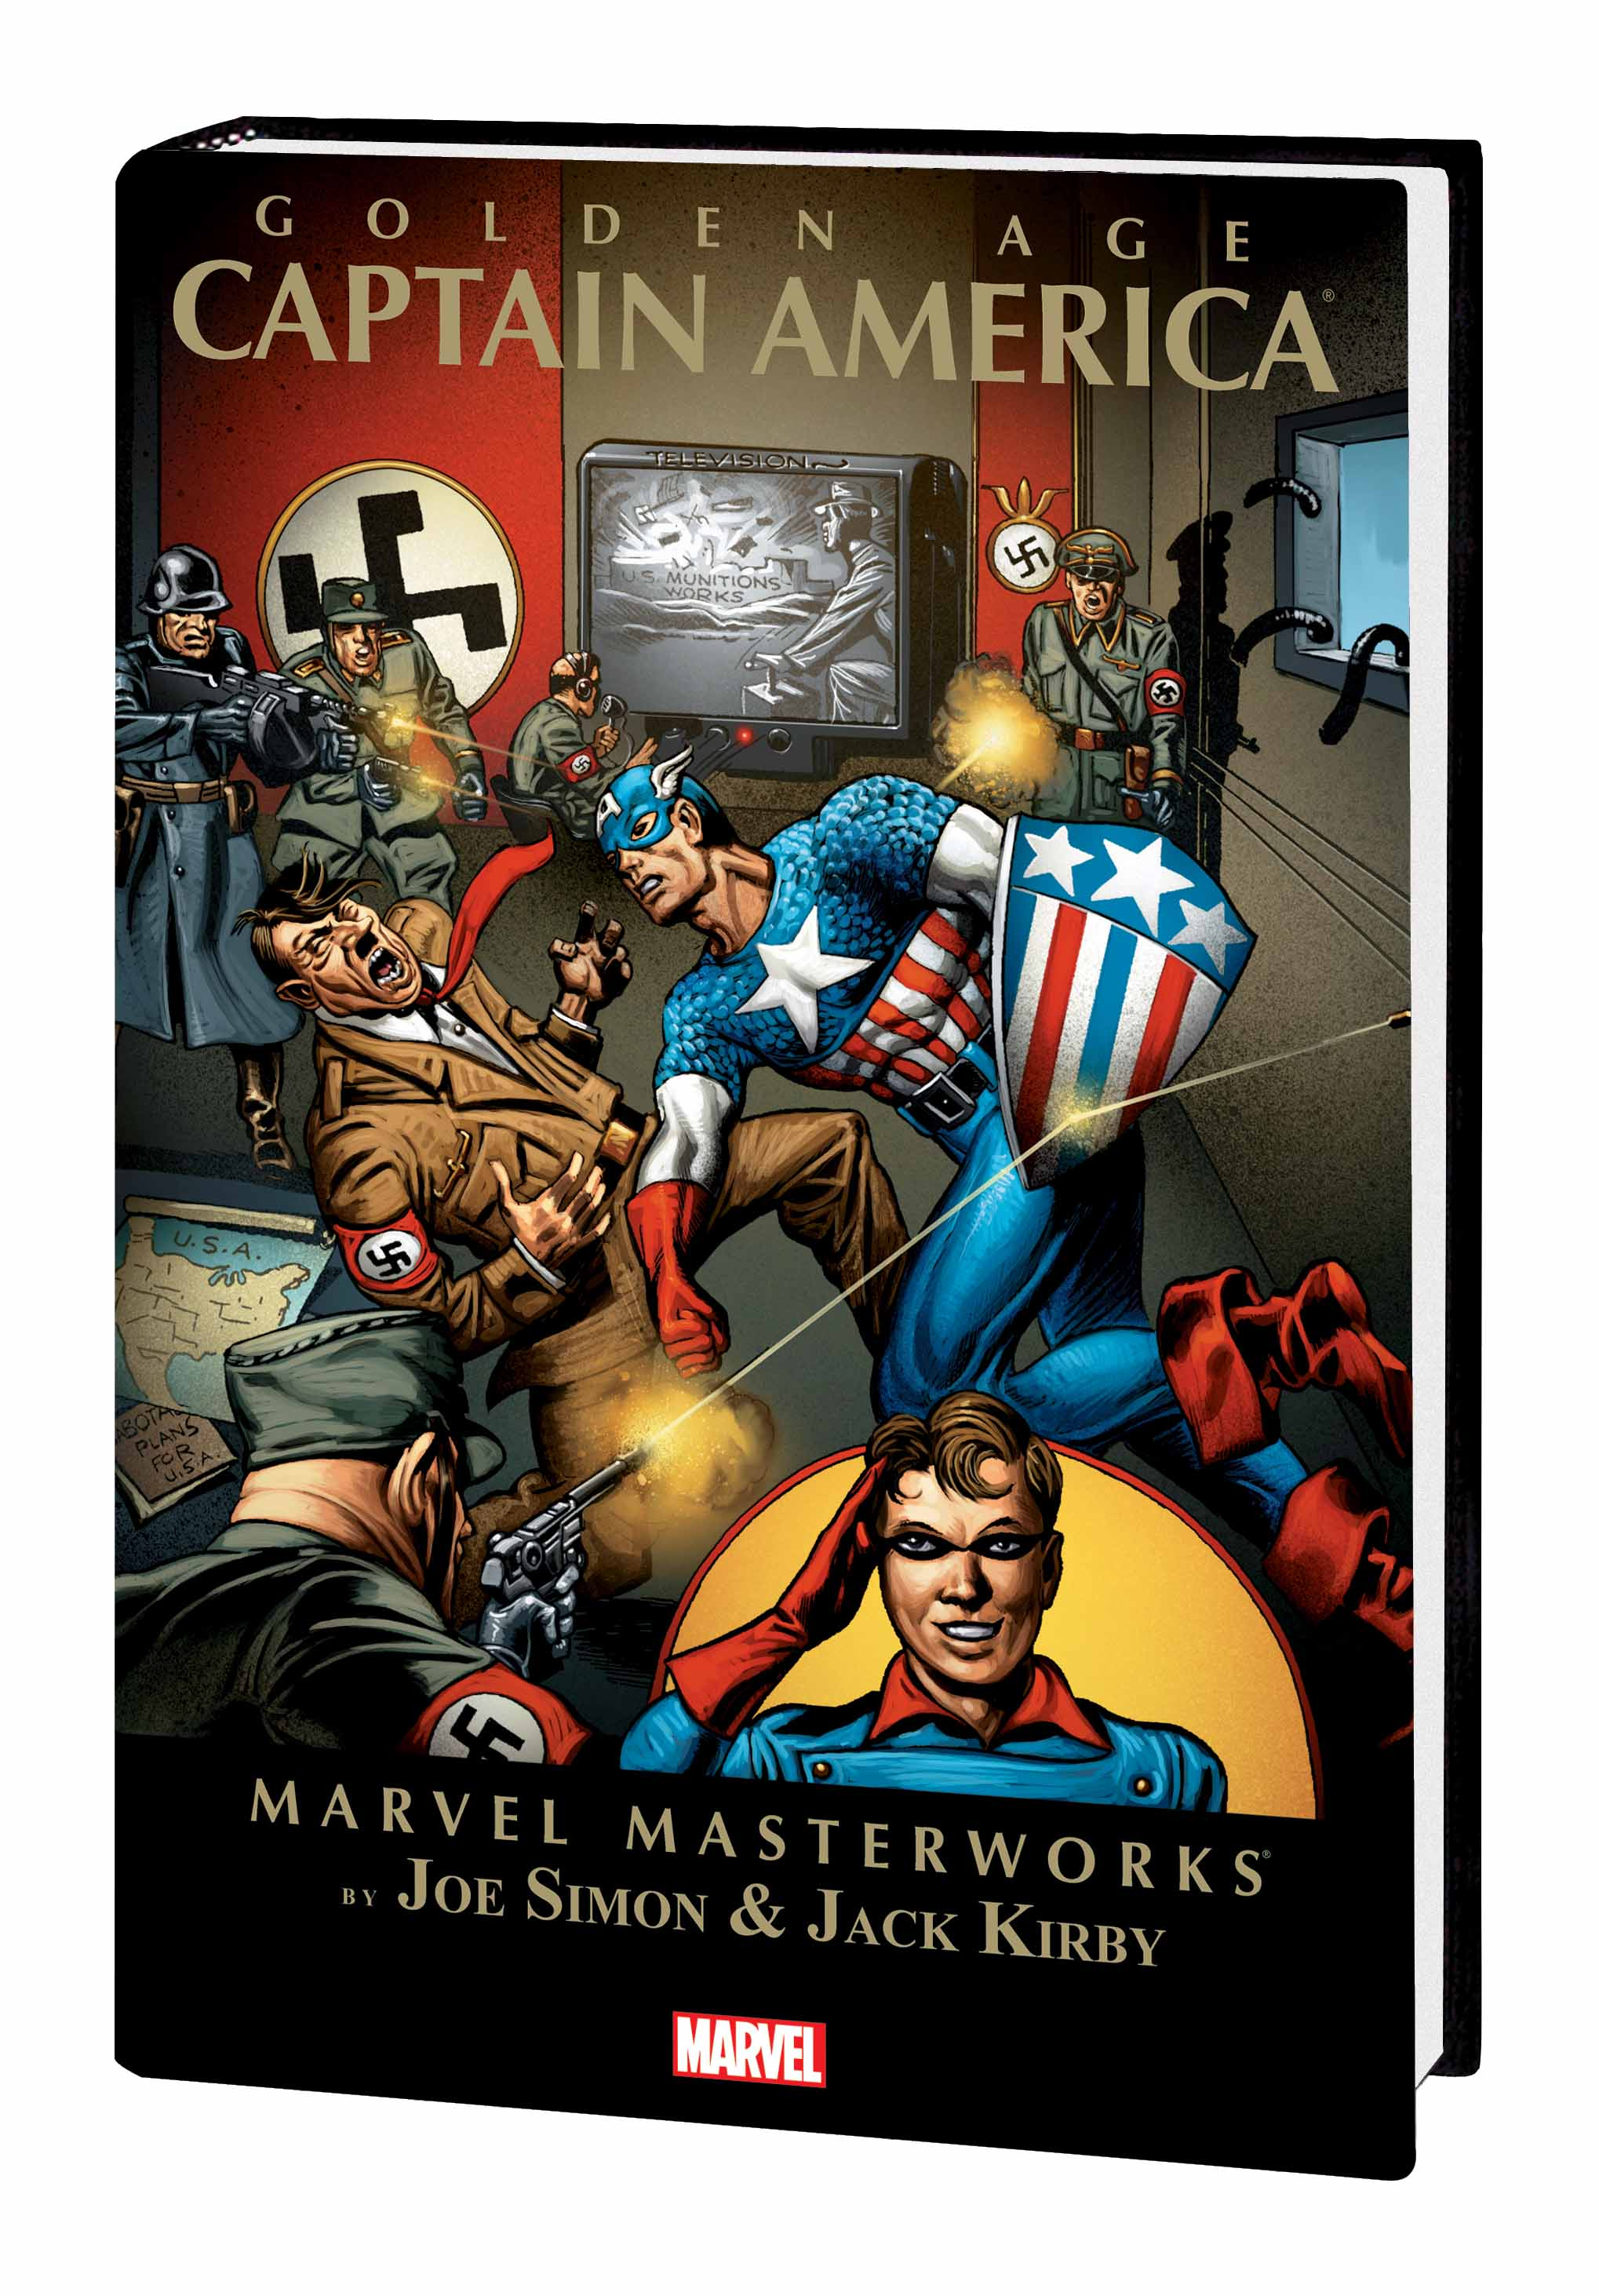 Marvel Masterworks: Golden Age Captain America Vol. 1 (Trade Paperback)